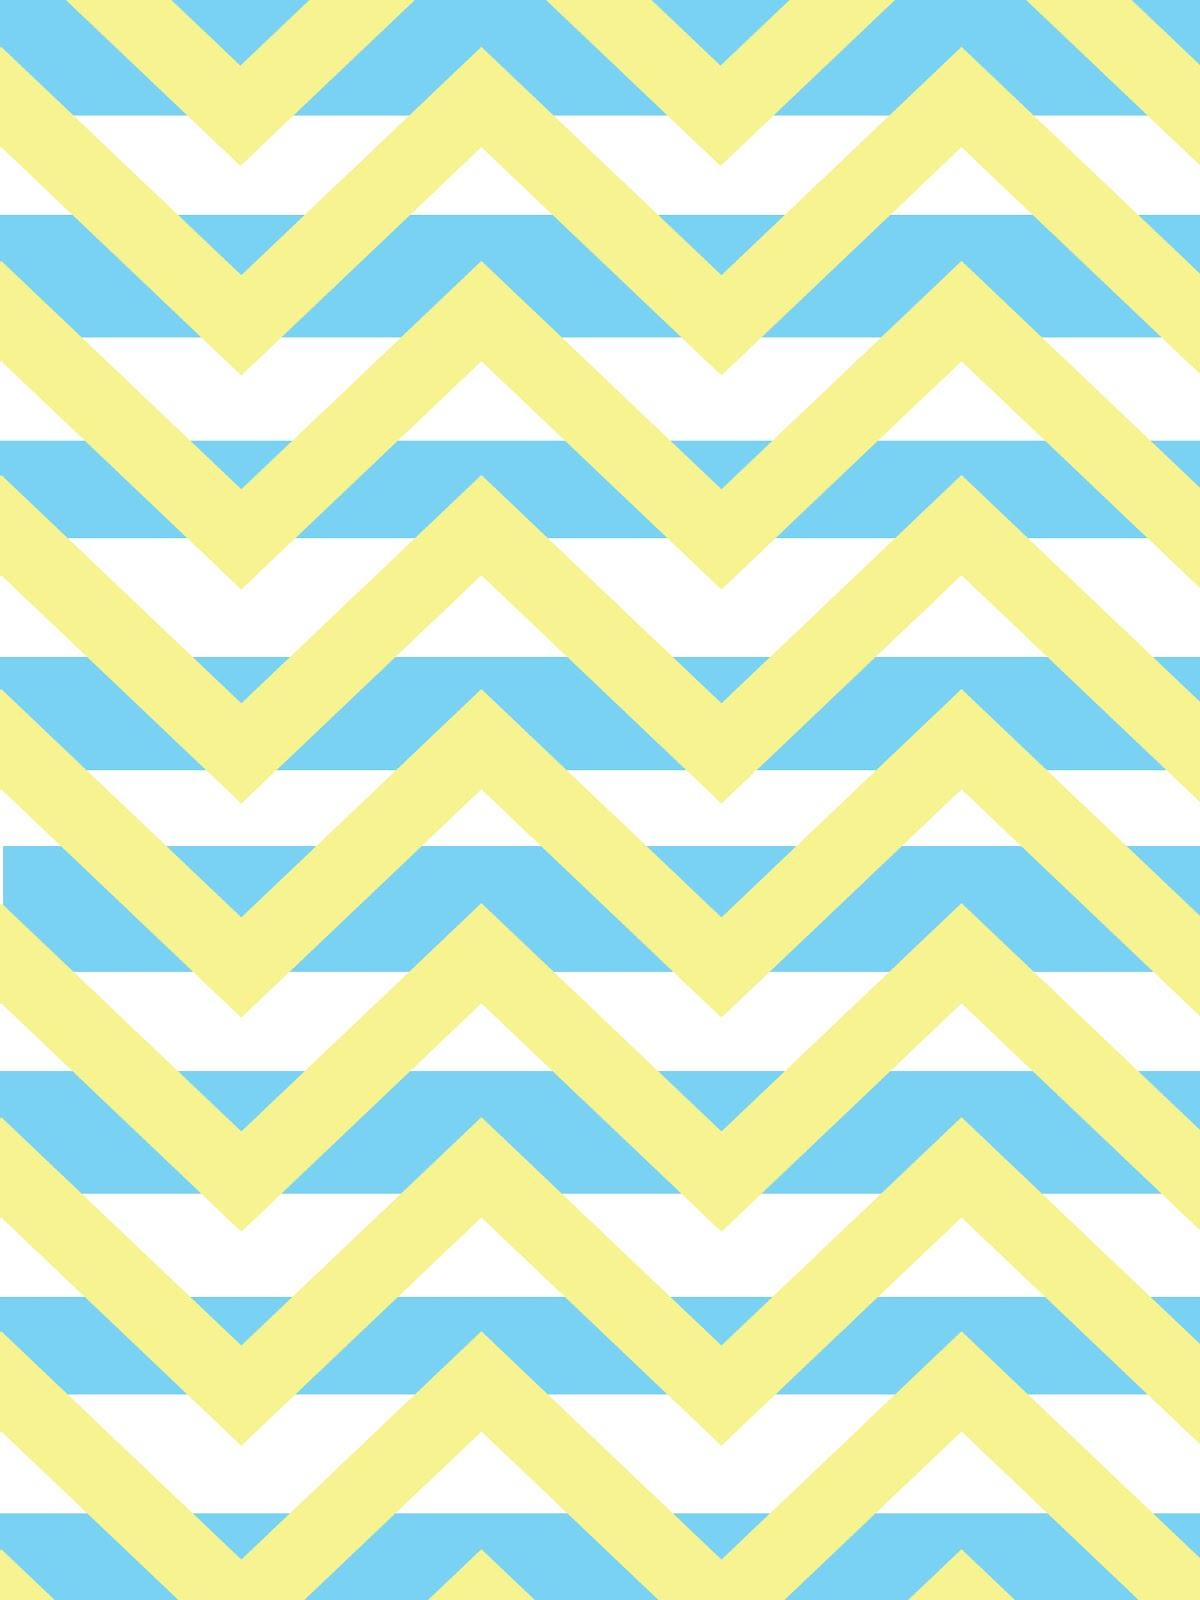 Green wallpaper background patterns and pattern wallpaper for Blue chevron wallpaper